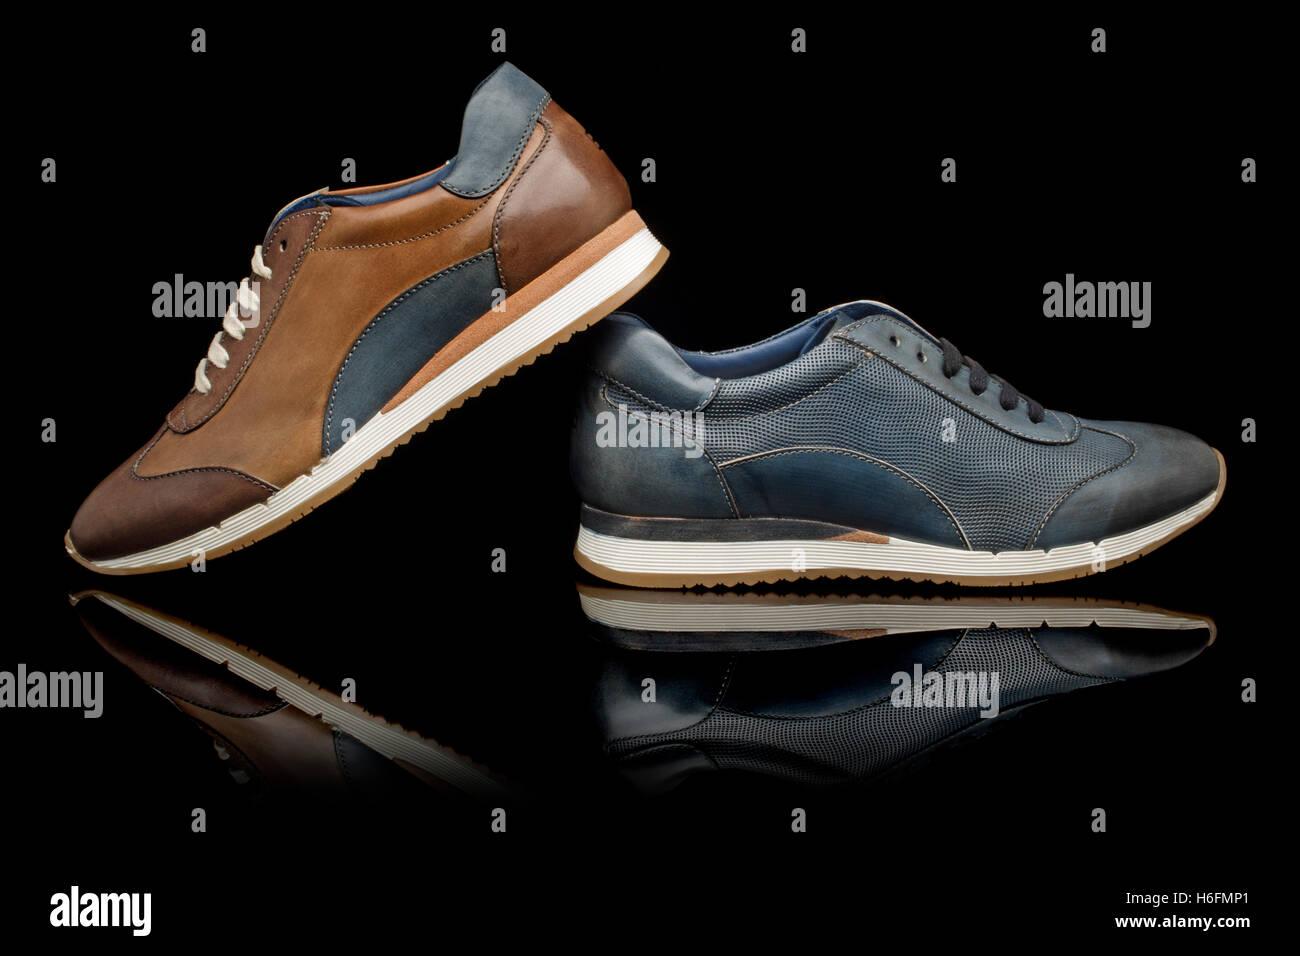 Handmade Color Shoes Stock Photos Amp Handmade Color Shoes